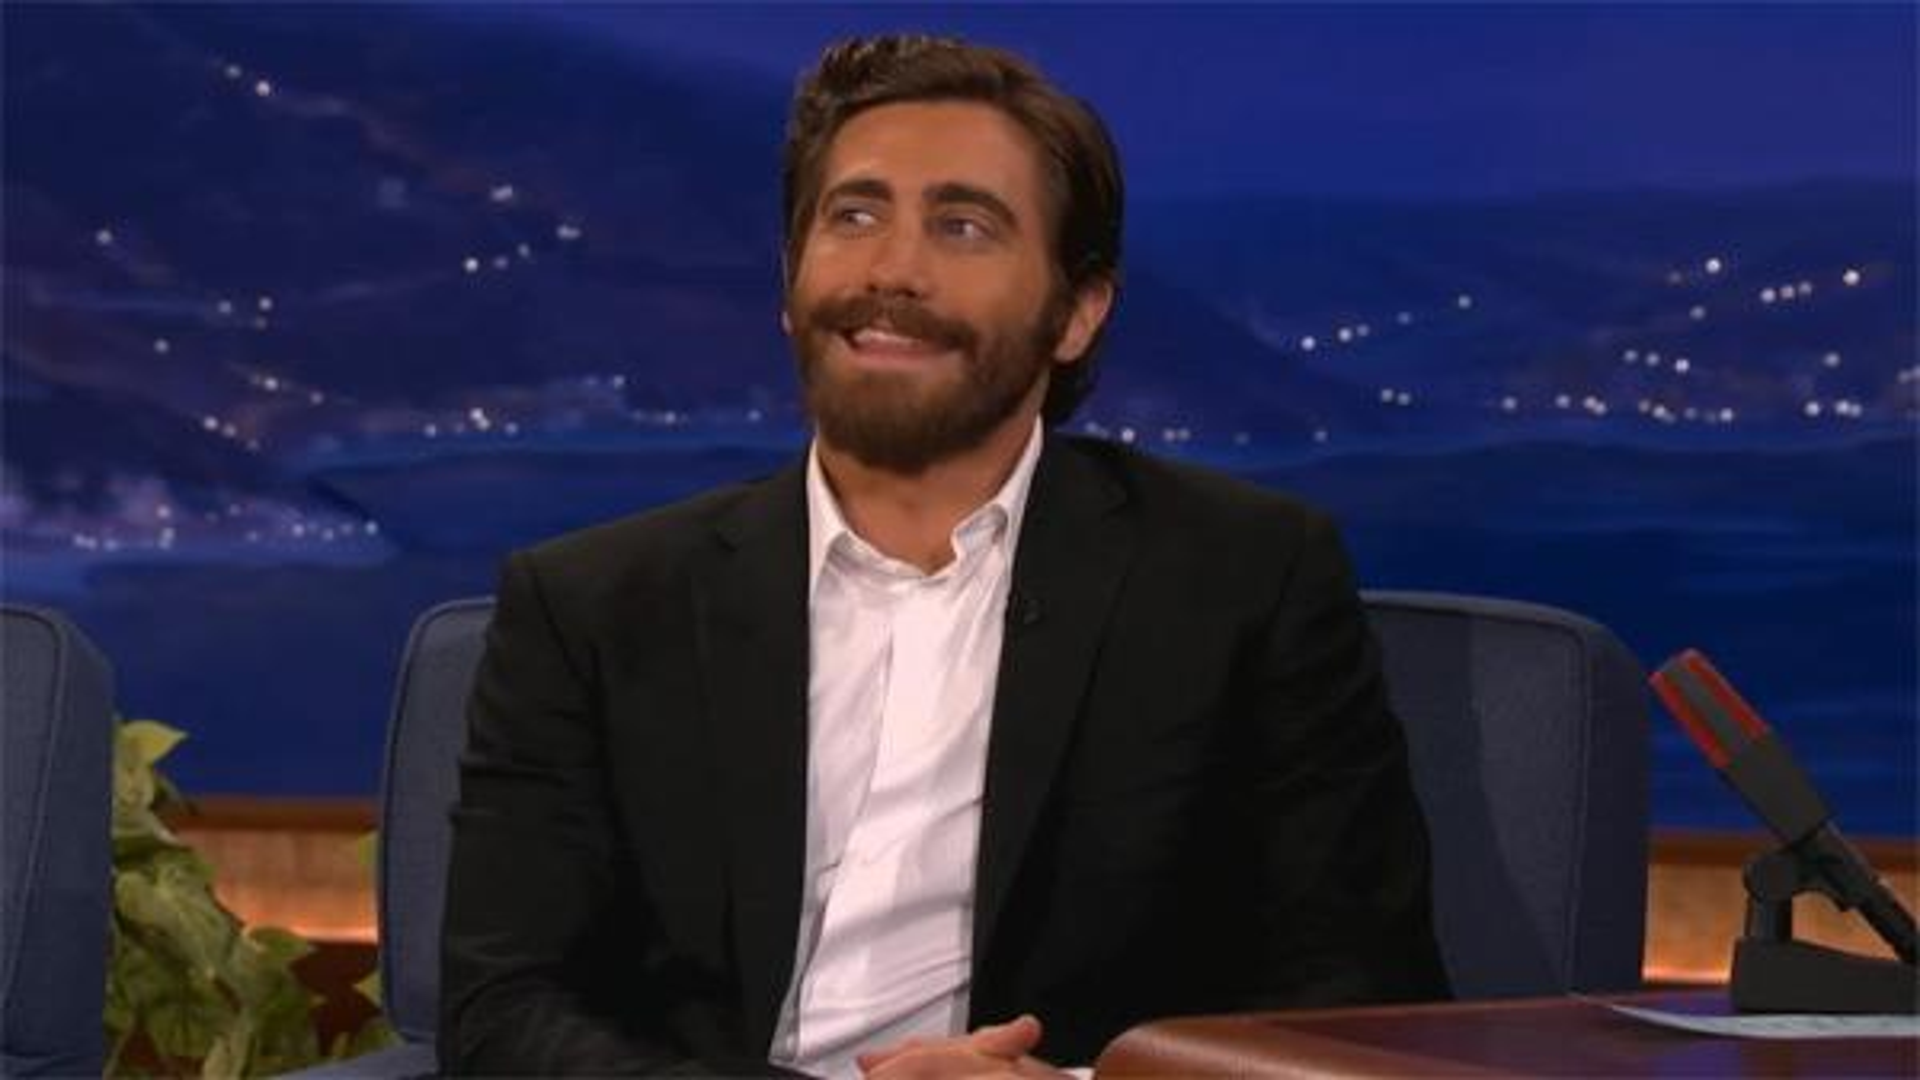 Jake-Gyllenhaal-Conan